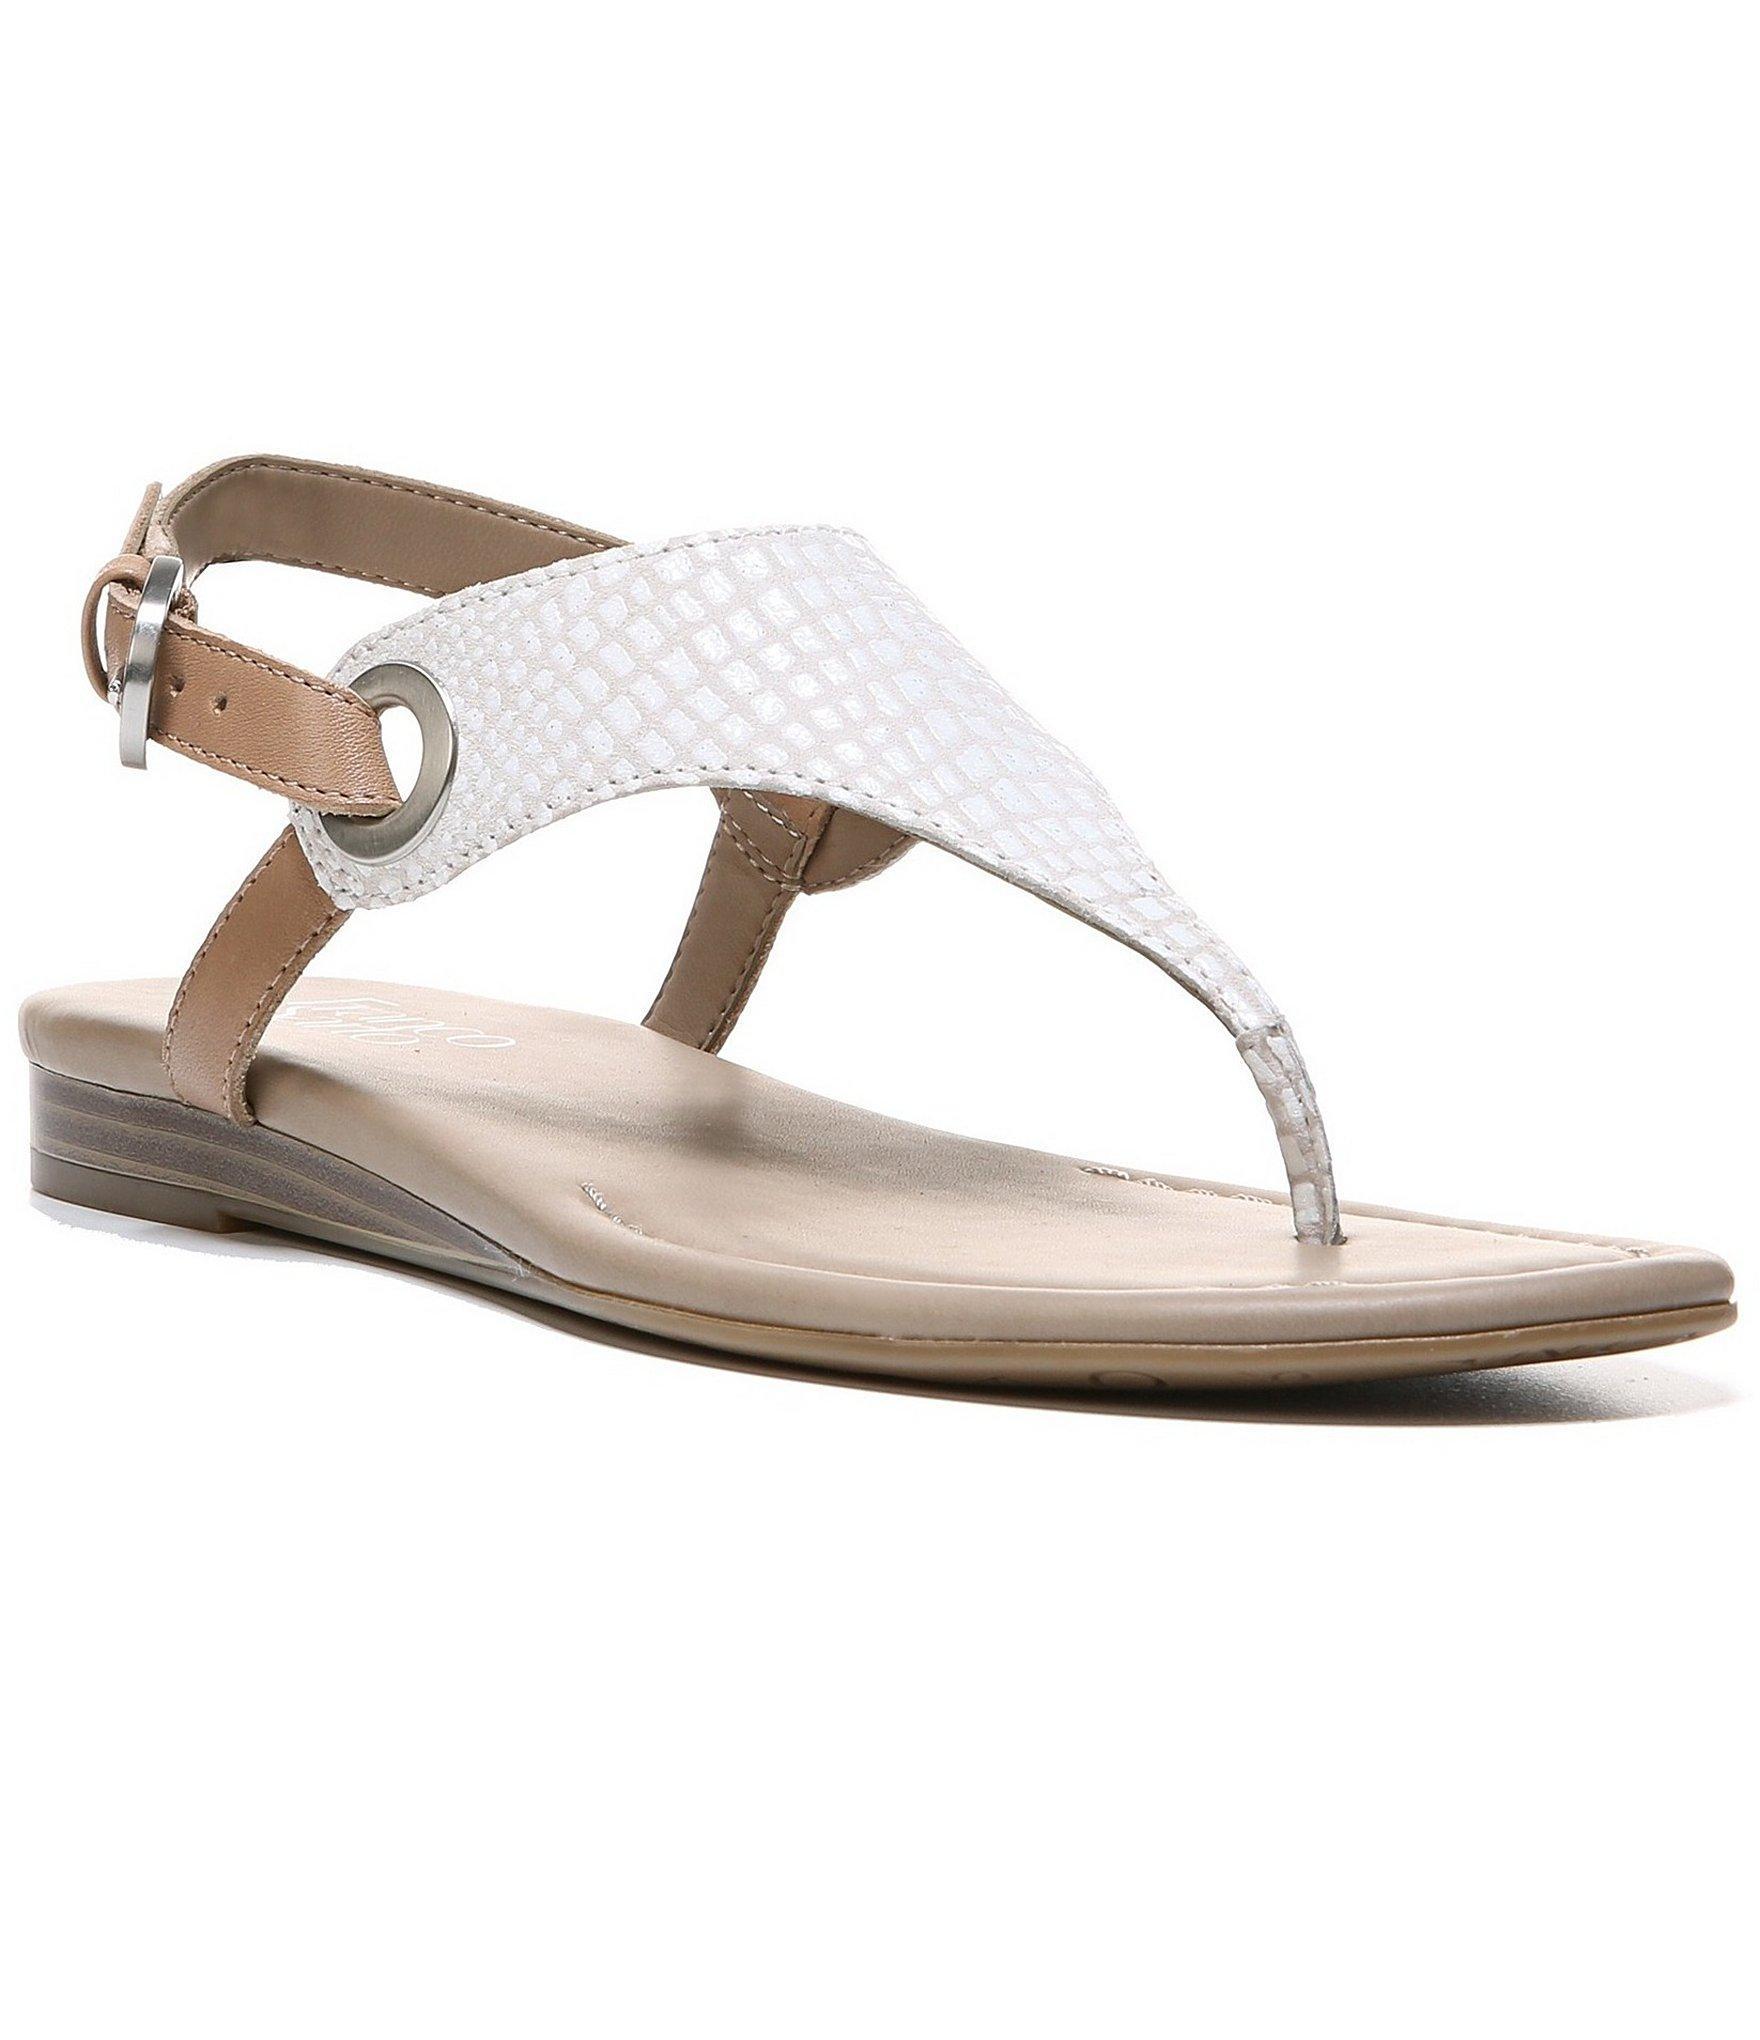 Lyst Franco Sarto Grip Sanke Print Thong Sandals